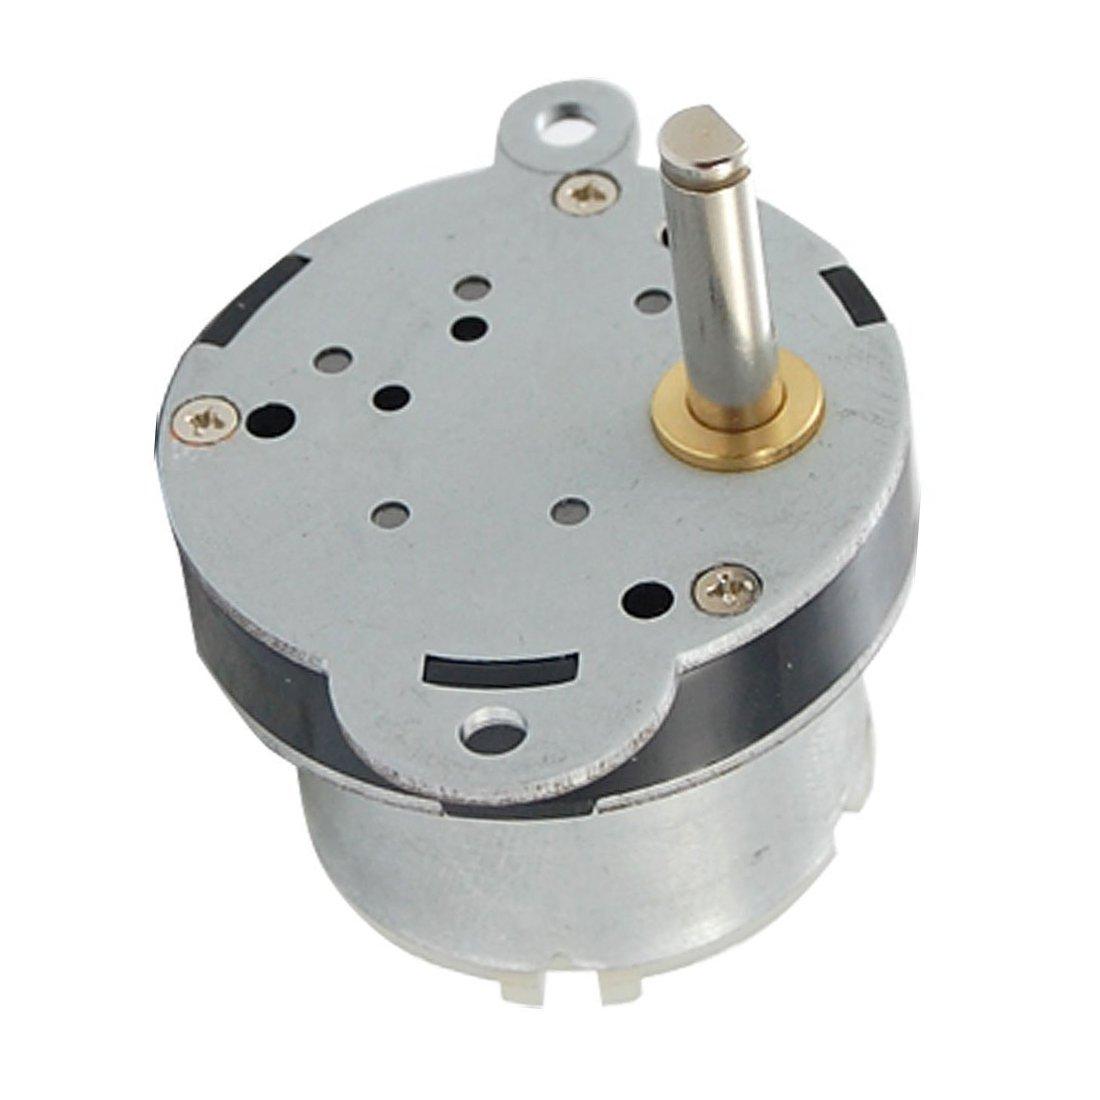 Yohii 7RPM DC 12V High Torque Electric DC Gear Box Motor Speed Reducer 5mm Dia Output Shaft for Robot